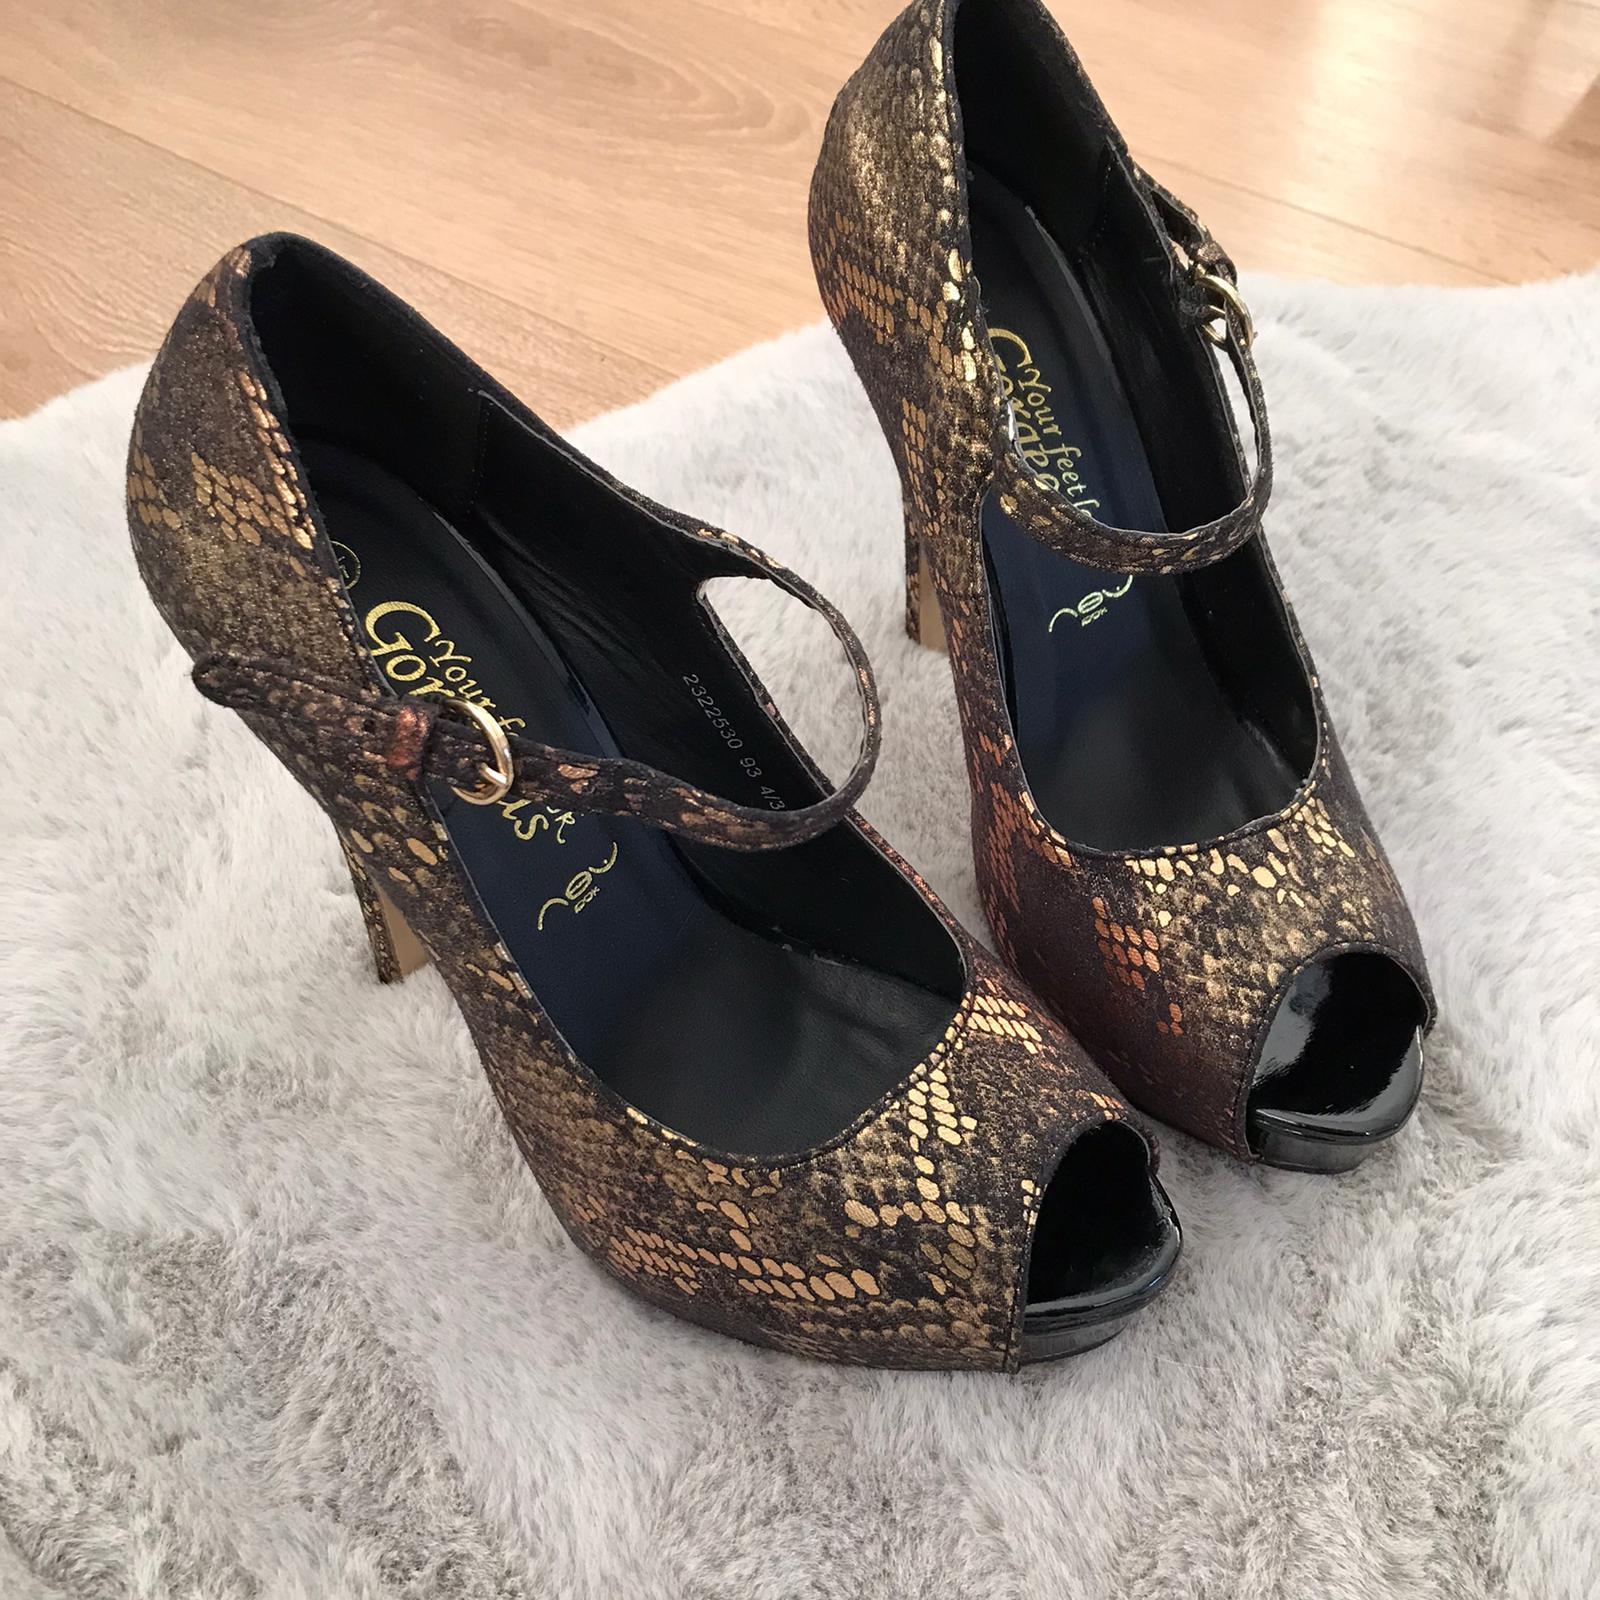 Topánky New Look  - Obrázok č. 1